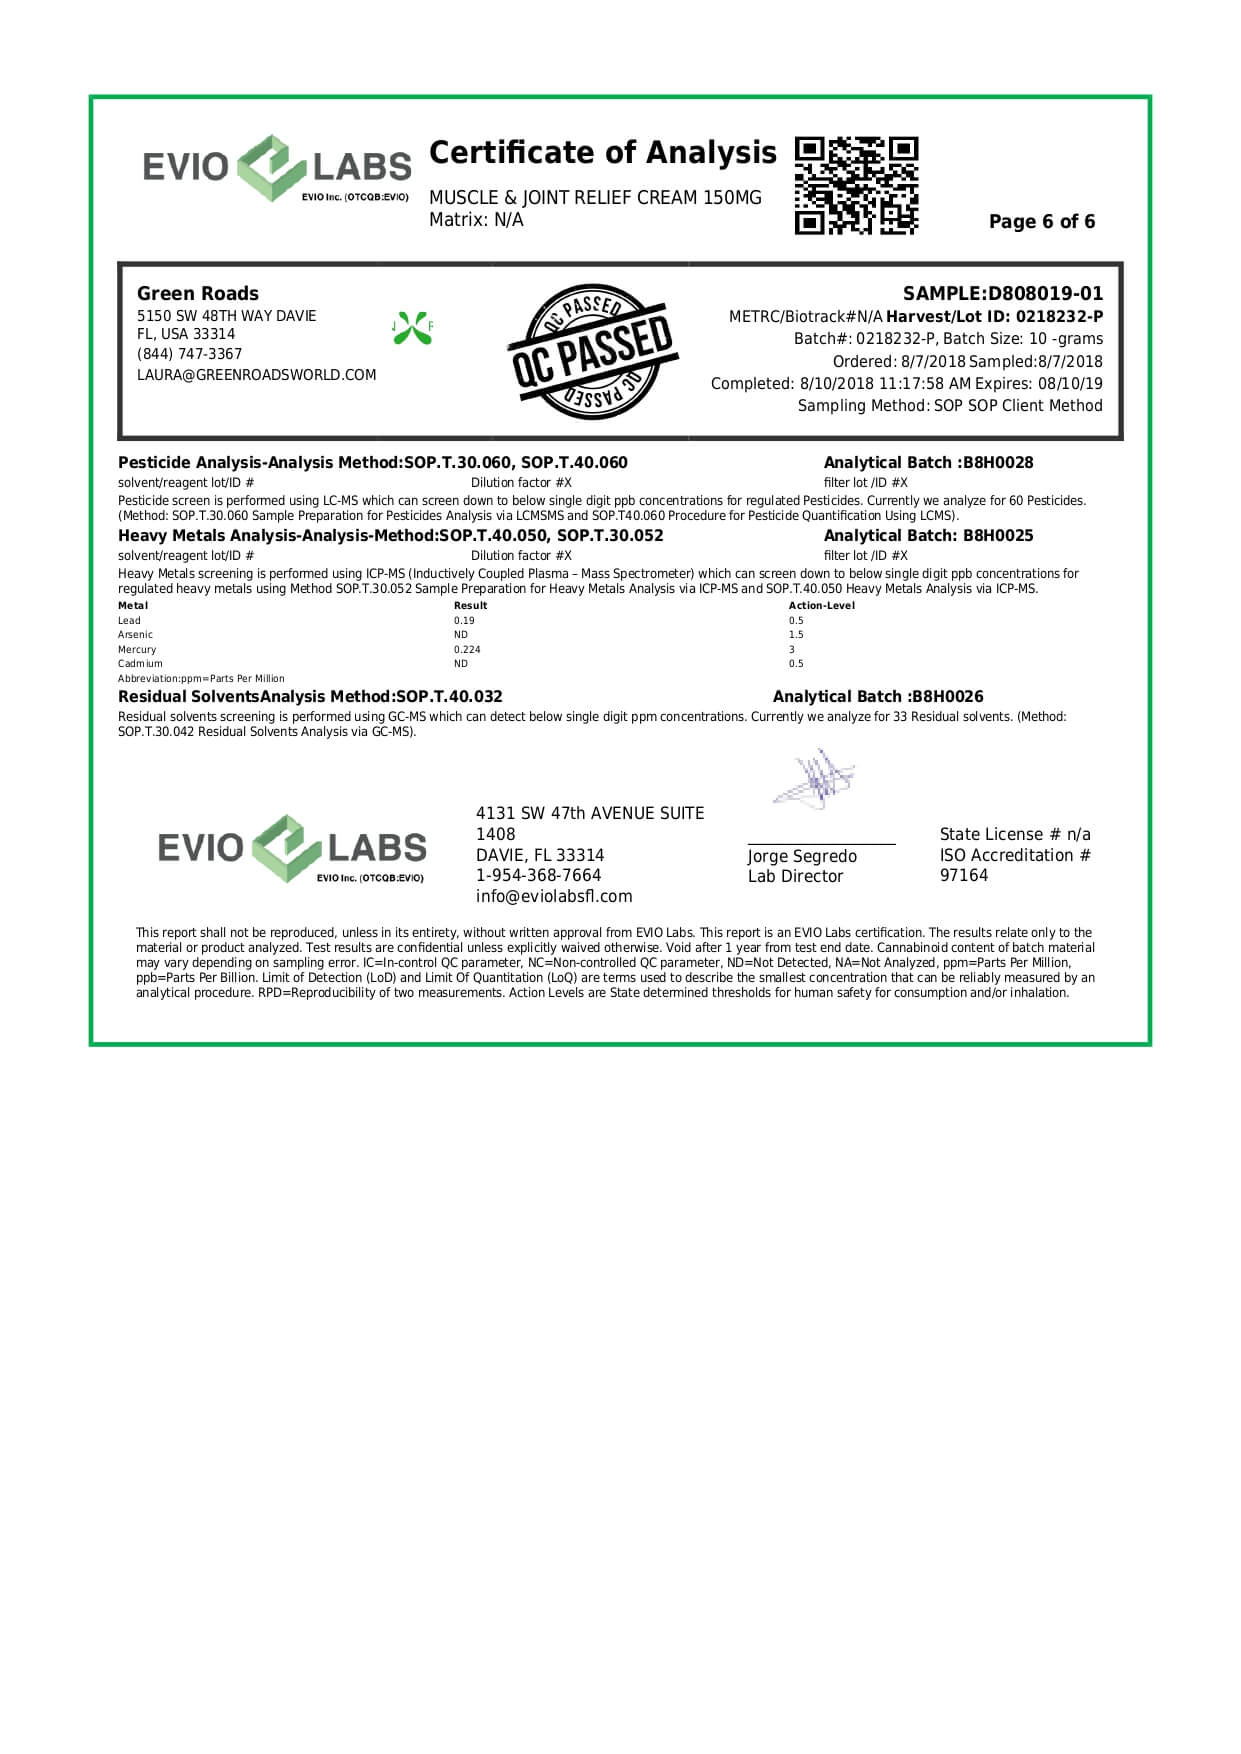 Green Roads CBD Topical Pain Cream 150mg Lab Report